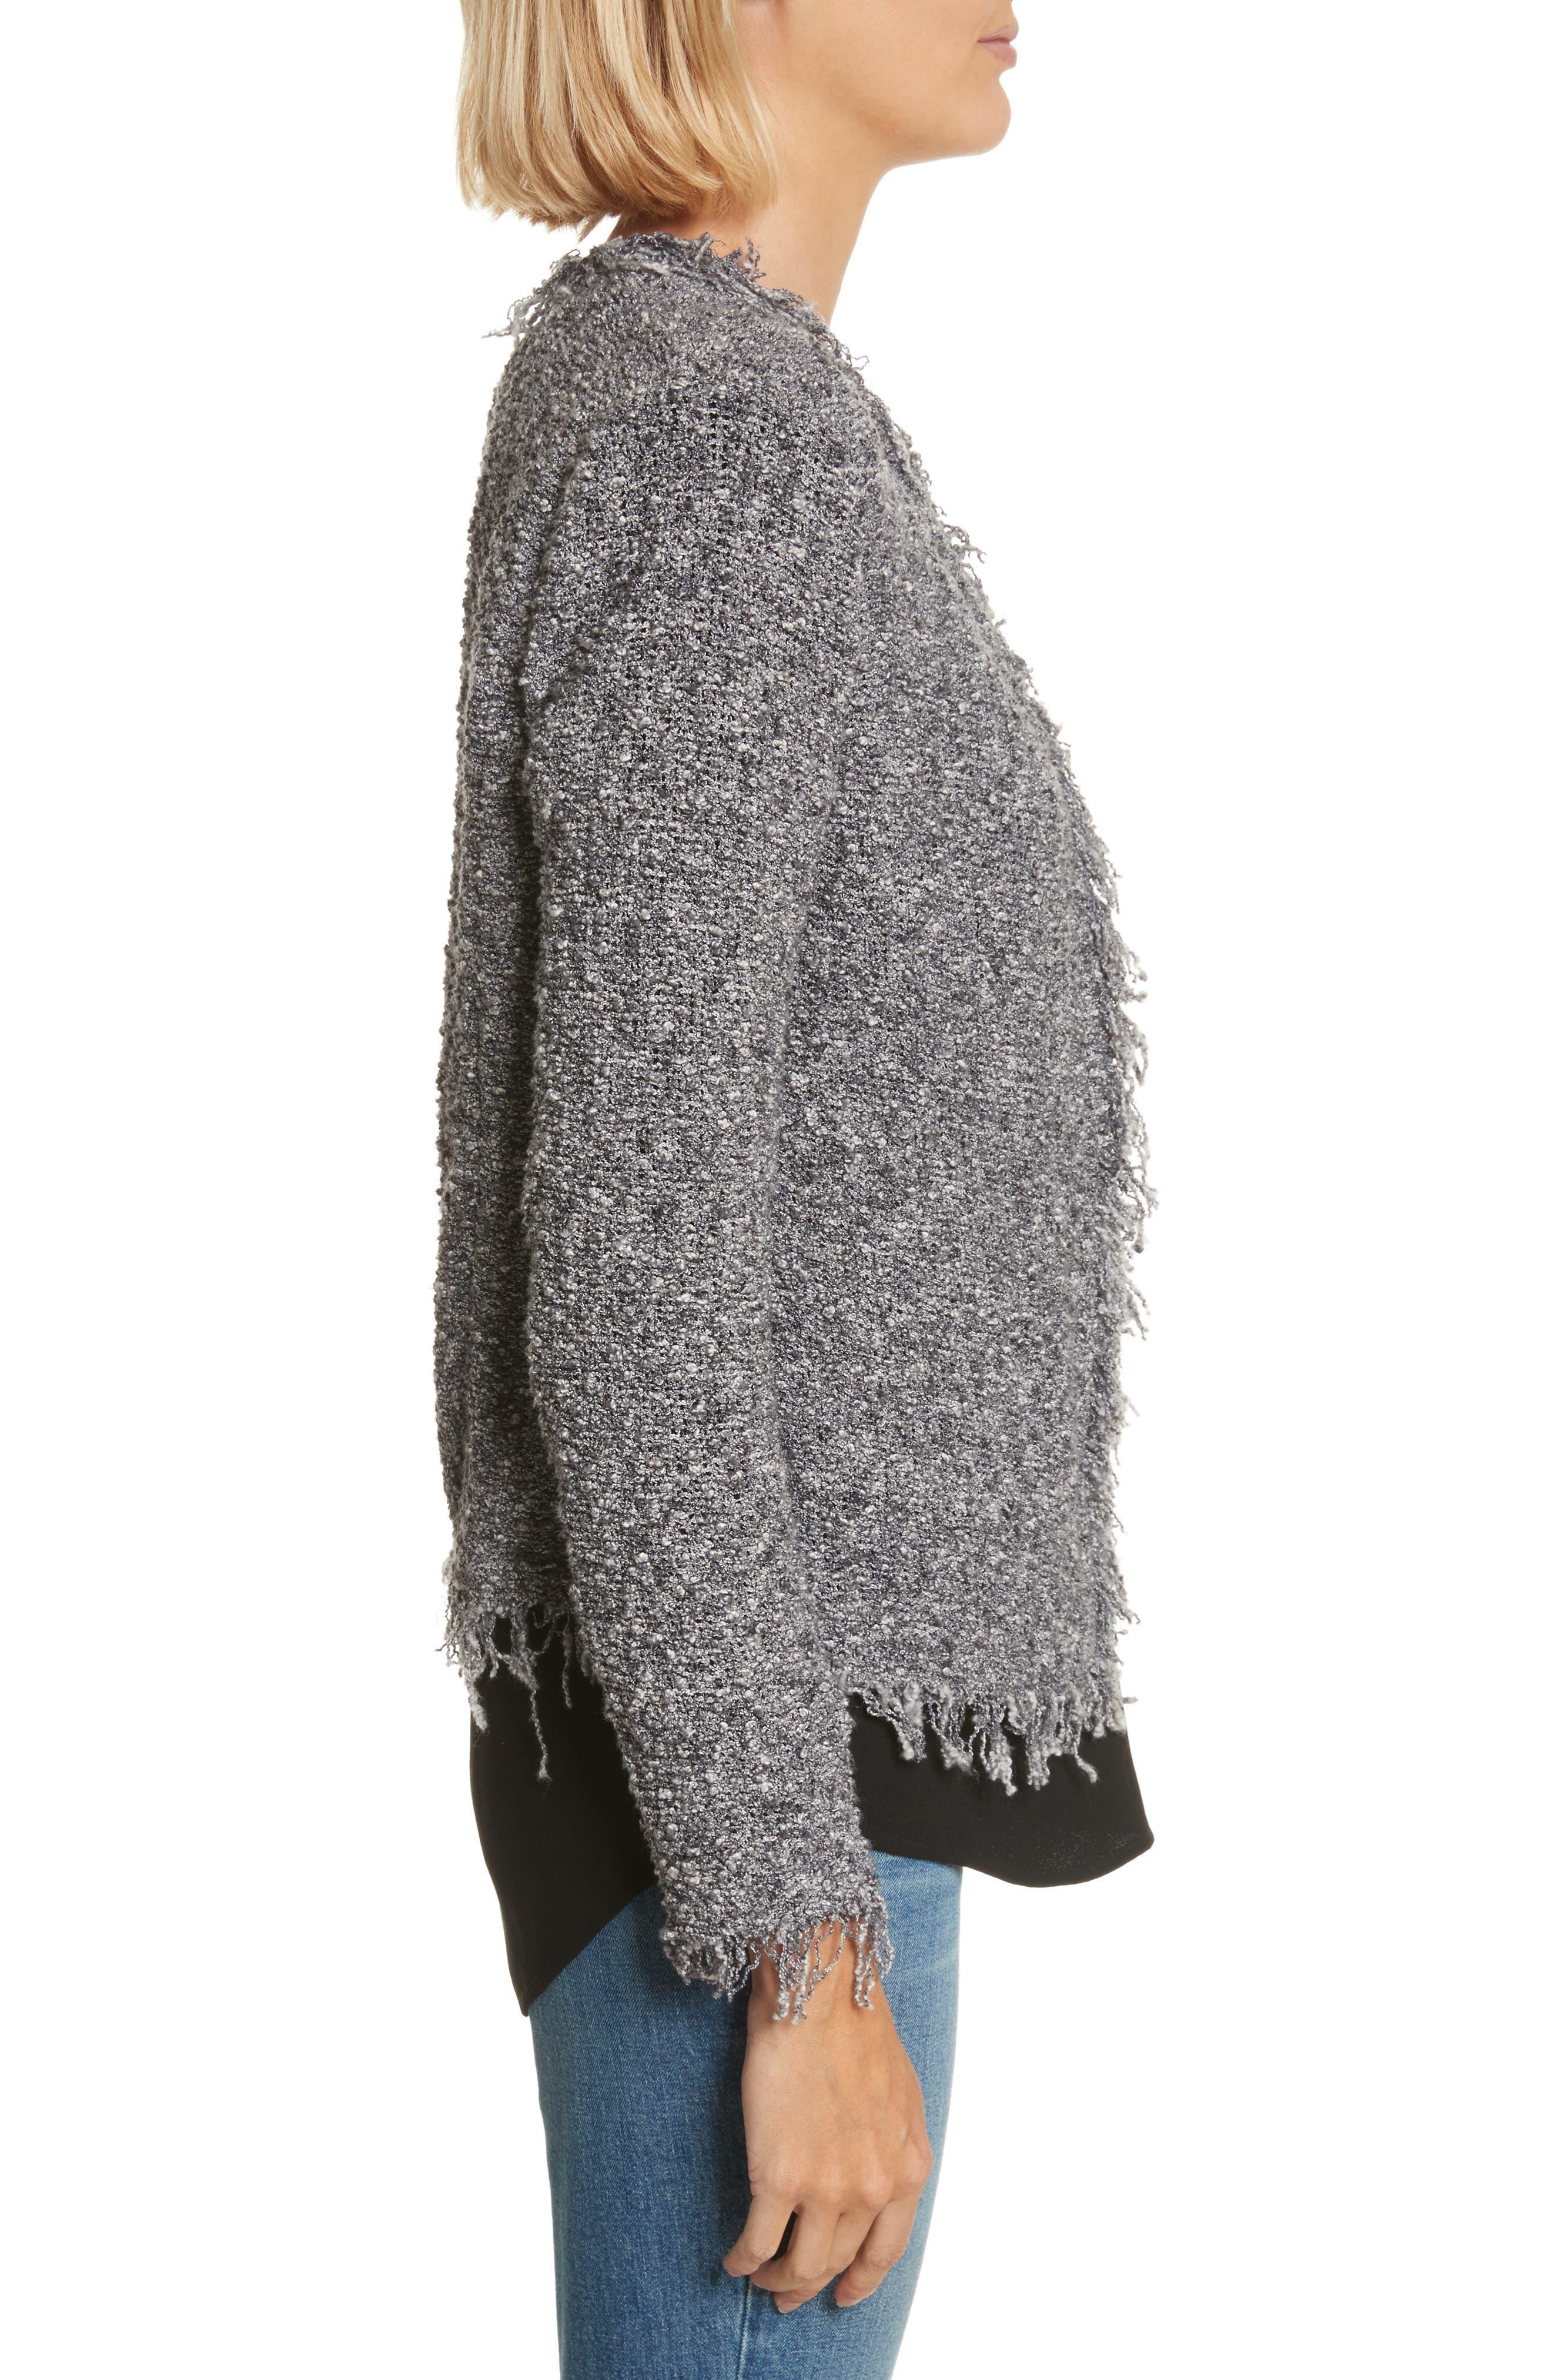 Shavanix Tweed Jacket,                             Alternate thumbnail 3, color,                             Dark Grey